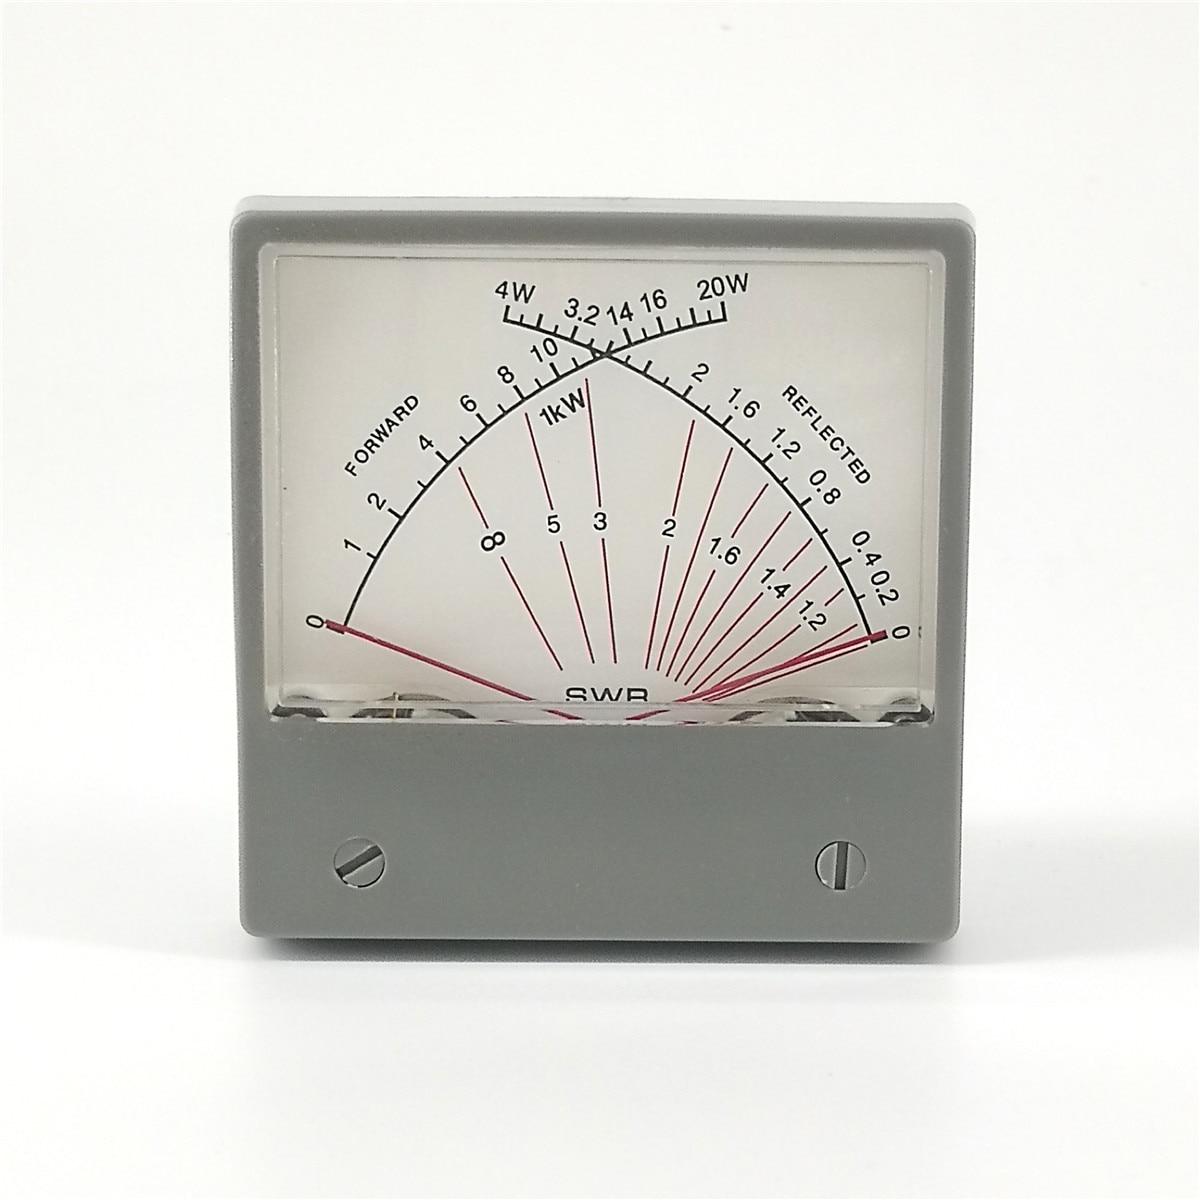 Stationary Standing Wave Ratio SWR Watt Meter Radio VU Meter Forward 20W Reflected 4W HF SZ-70-1